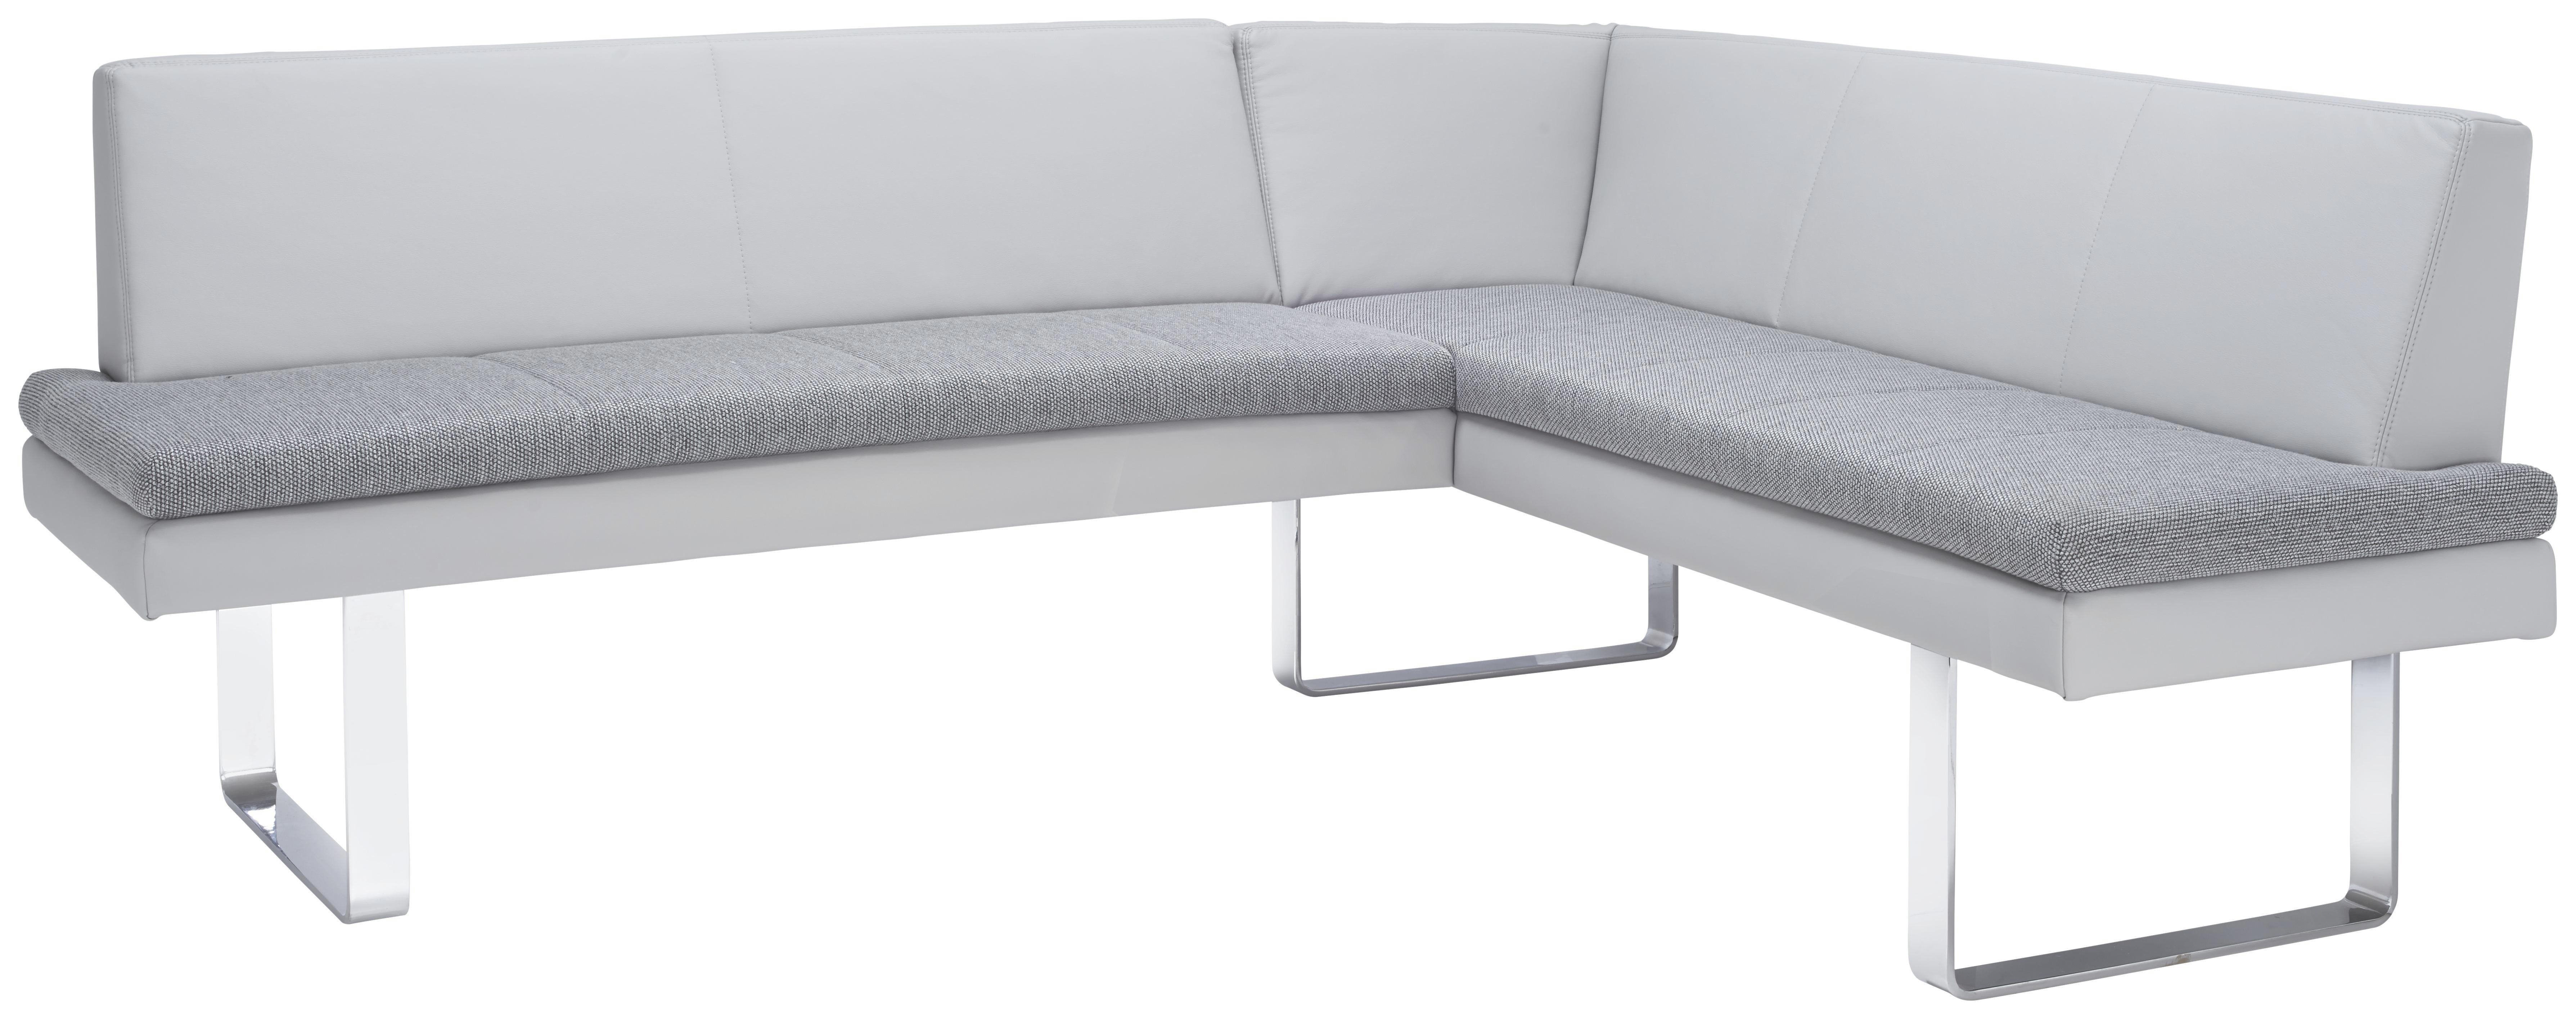 Eckbank in Grau - Chromfarben/Grau, MODERN, Textil/Metall (208/170cm) - PREMIUM LIVING